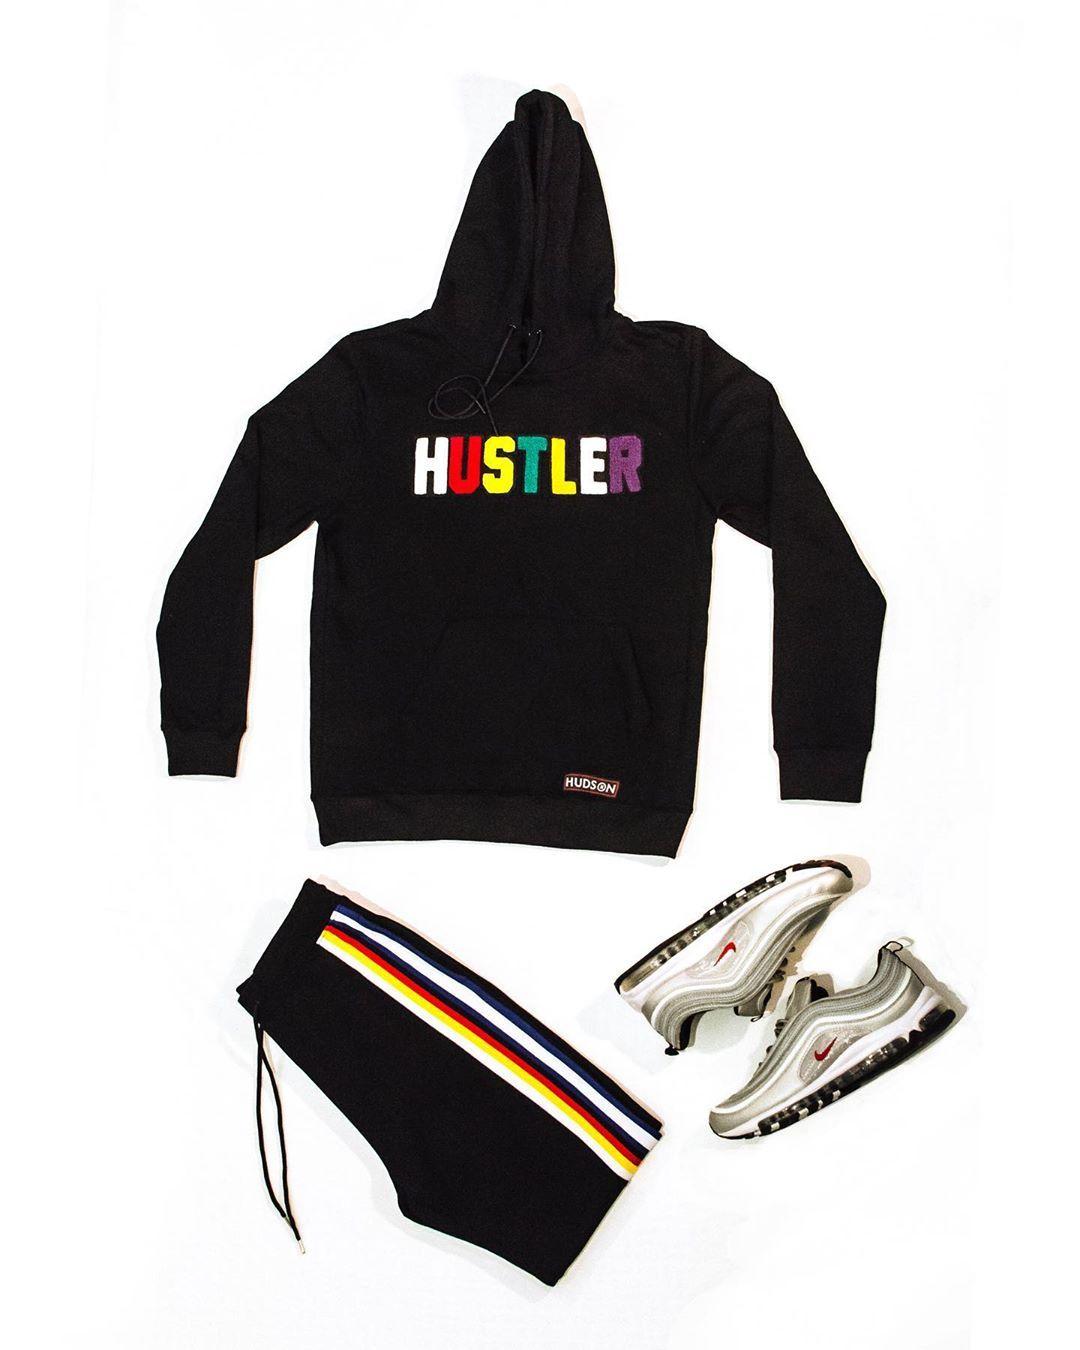 Hudson Outerwear On Instagram Every Day I M Hustlin Newarrivals Outerwear Hudson Adidas Jacket [ 1350 x 1080 Pixel ]